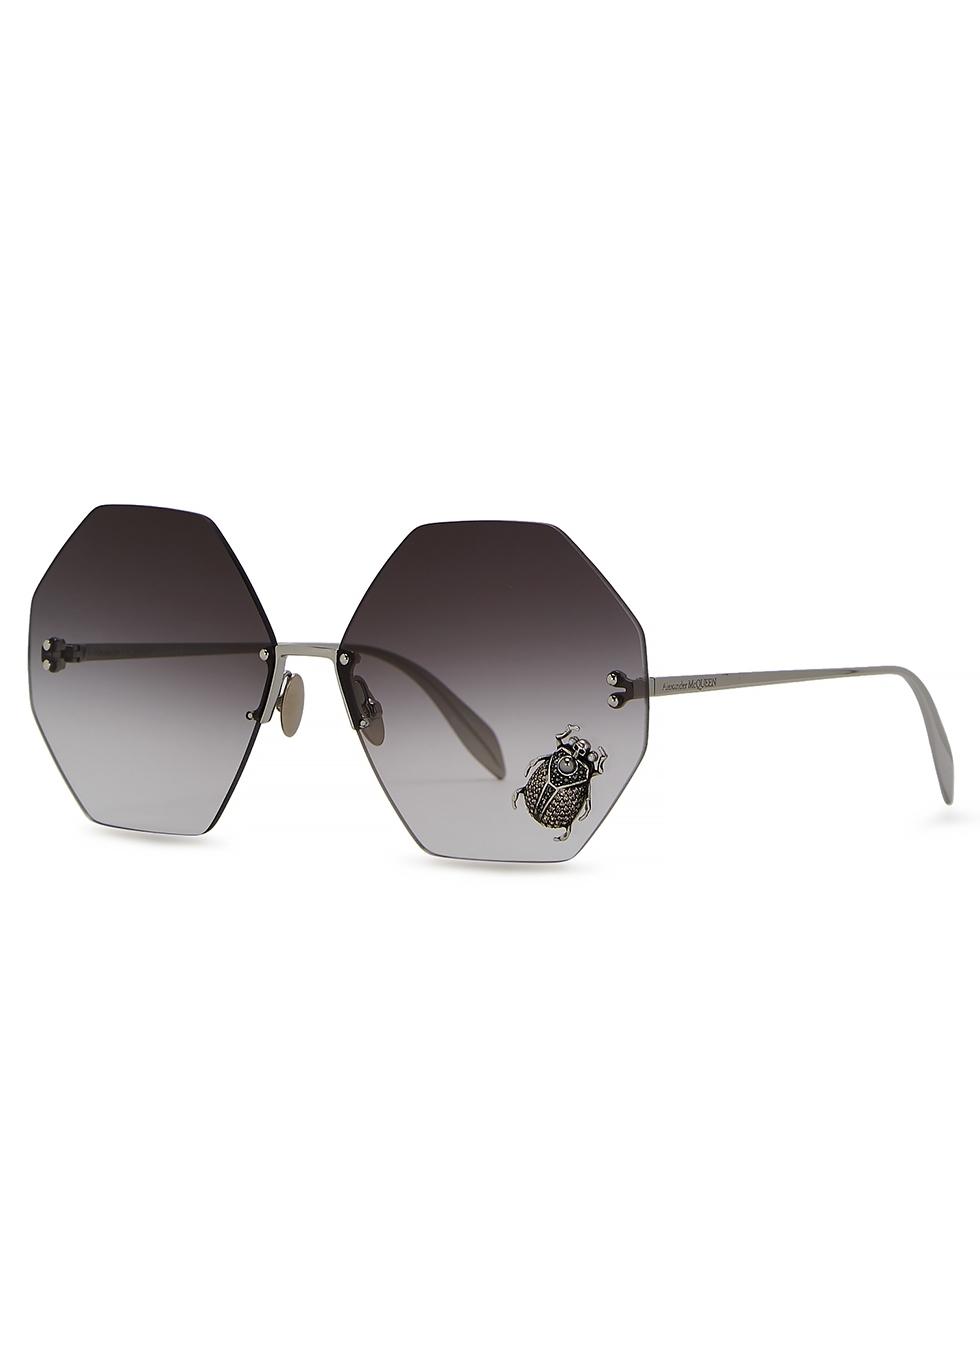 2dce360257eb2 Women s Designer Sunglasses and Eyewear - Harvey Nichols